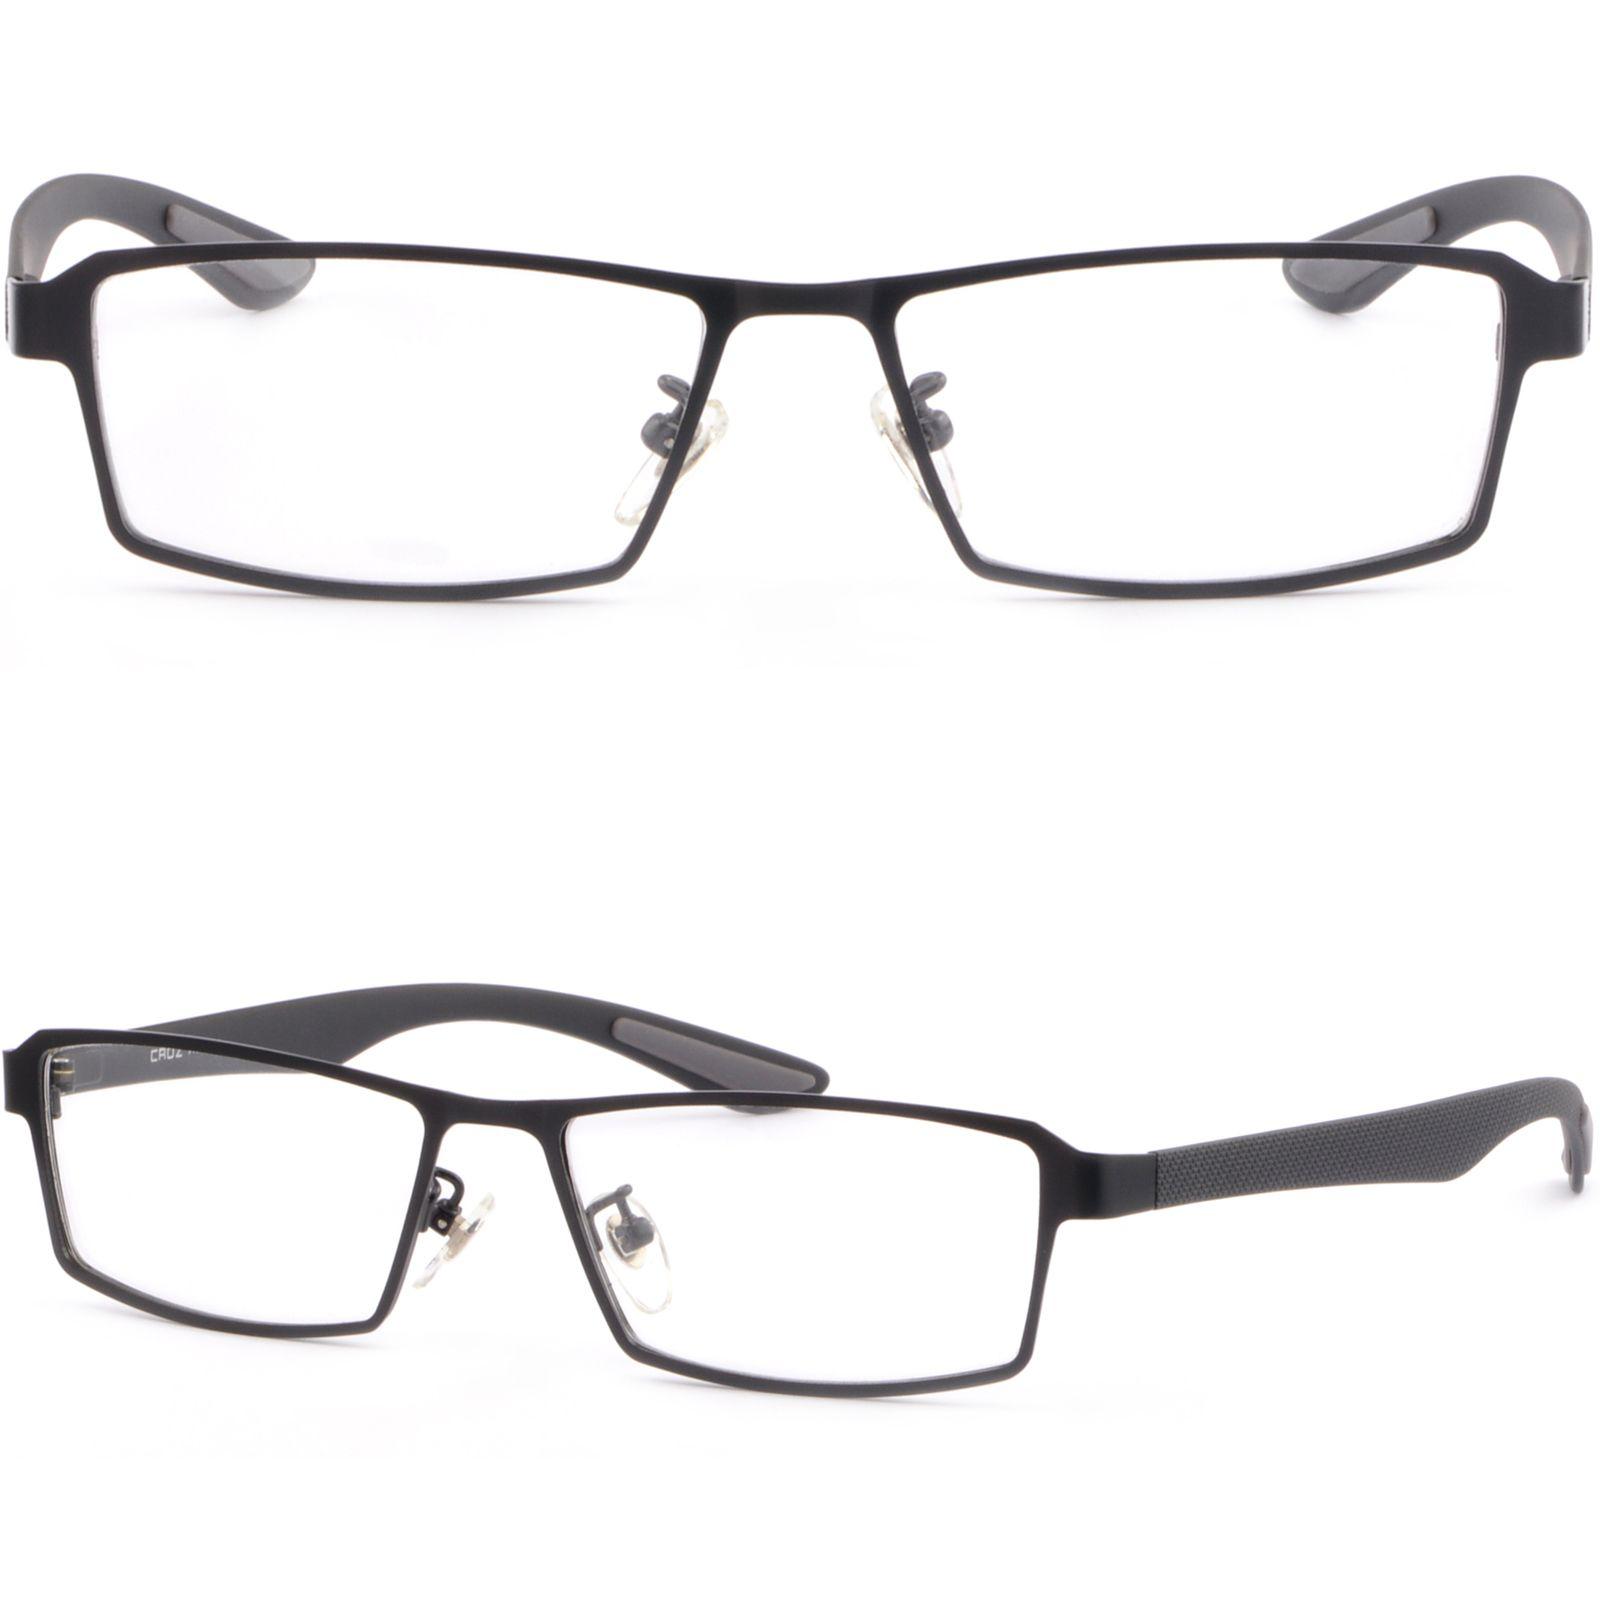 75a402764eb Black Light Mens Titanium Frames Plastic Arm Prescription Eye Glasses  Sunglasses Glasses Frame Online with  43.06 Piece on Aceglasses s Store